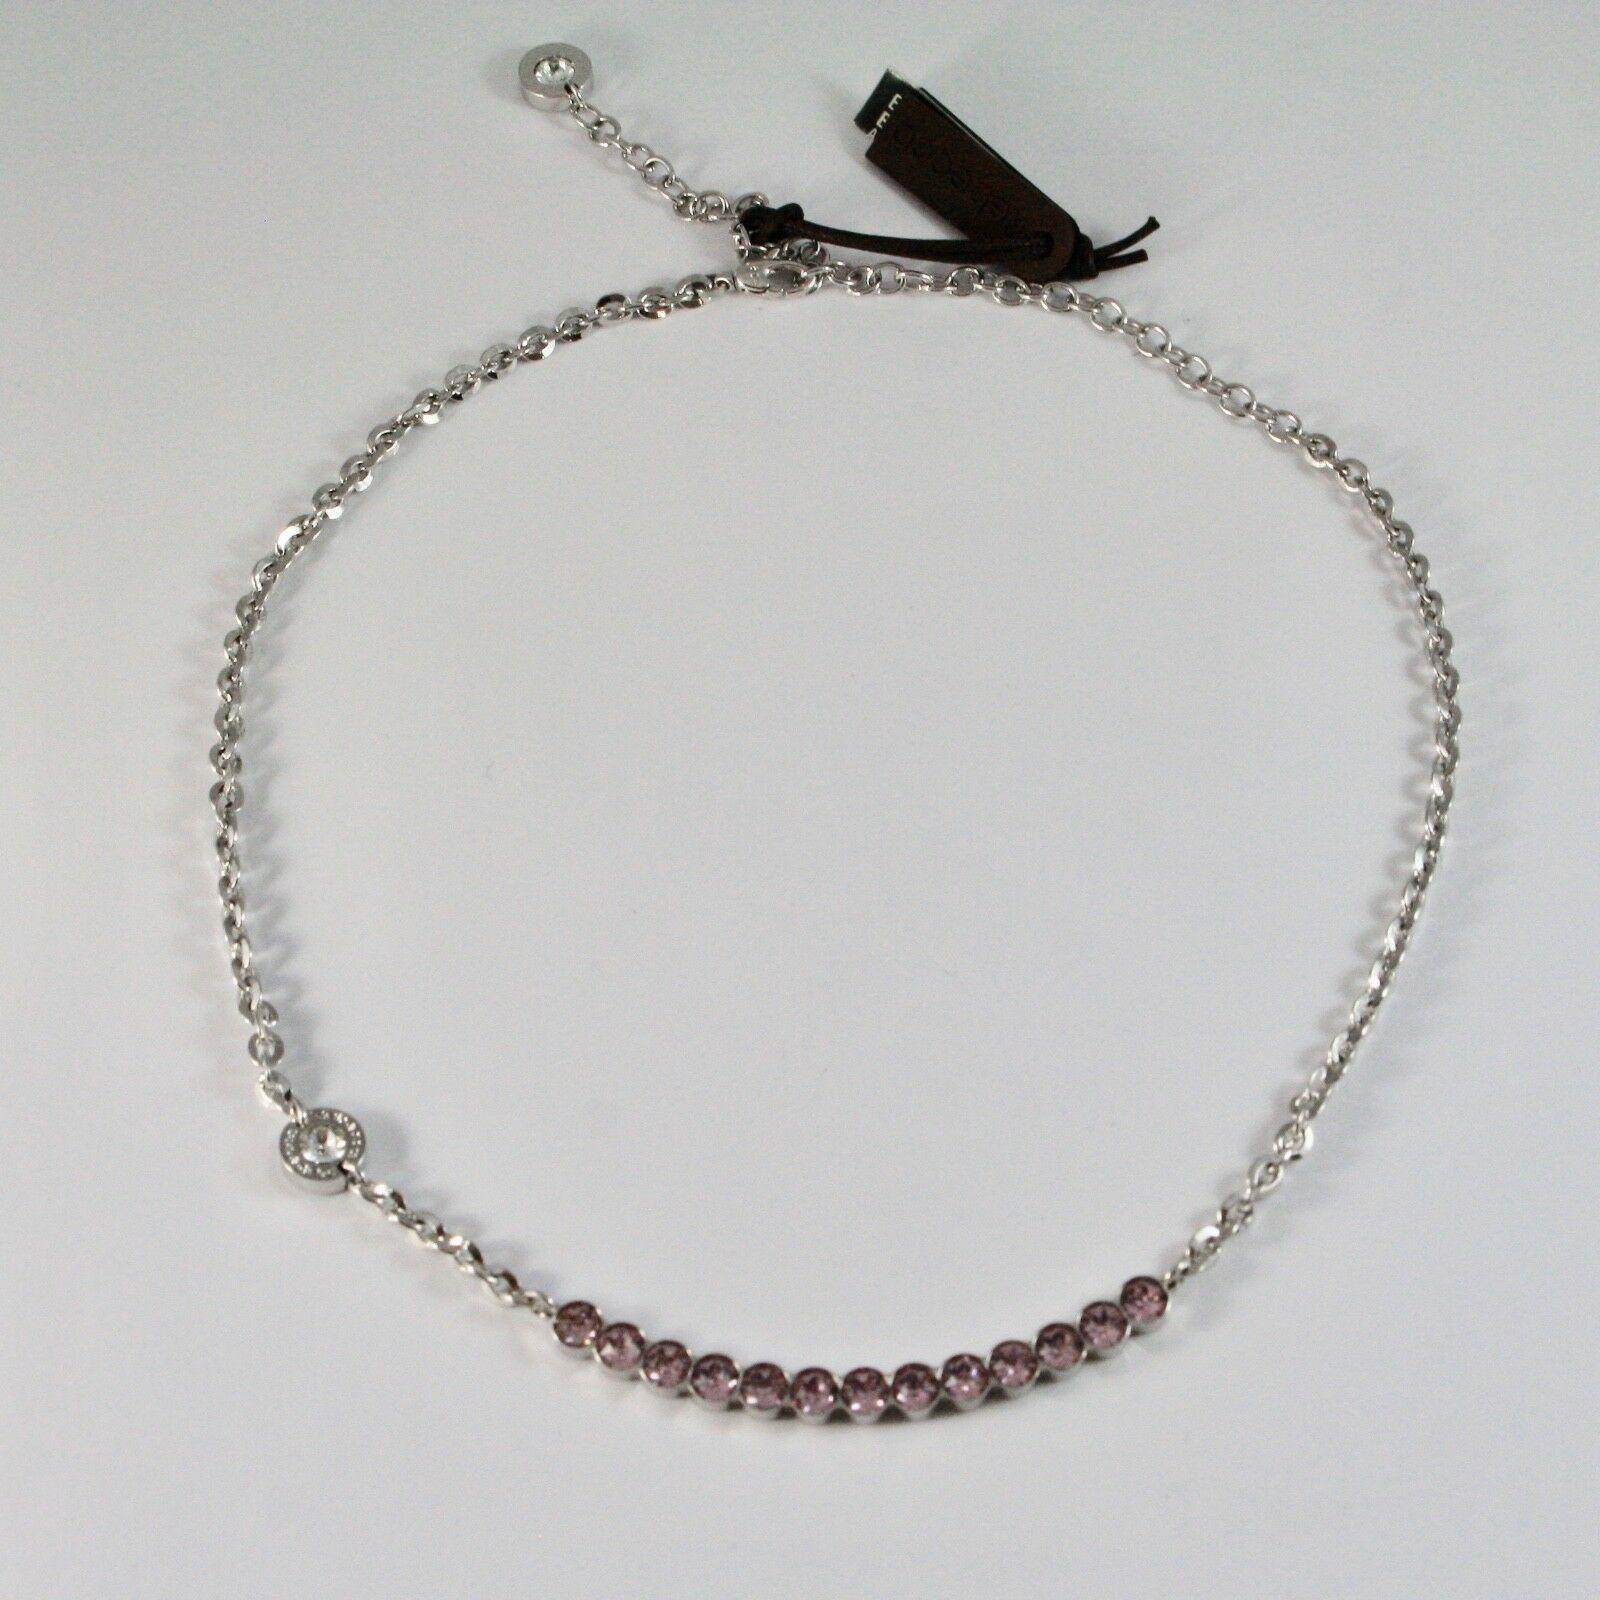 Necklace Rebecca Bronze with Crystals Pink Brilliant Cut BPBKBA14